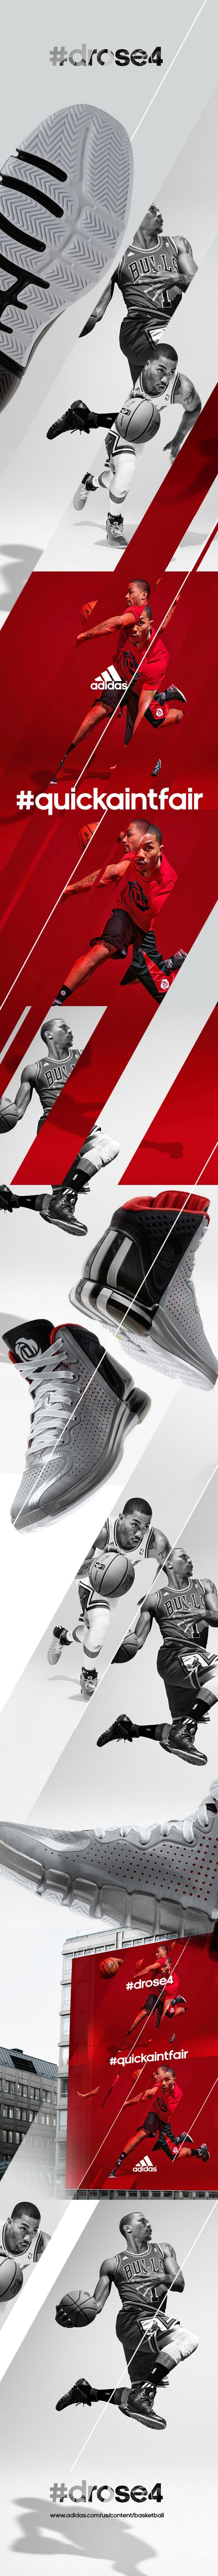 Adidas Drose4 by Julio Ferreira, via Behance